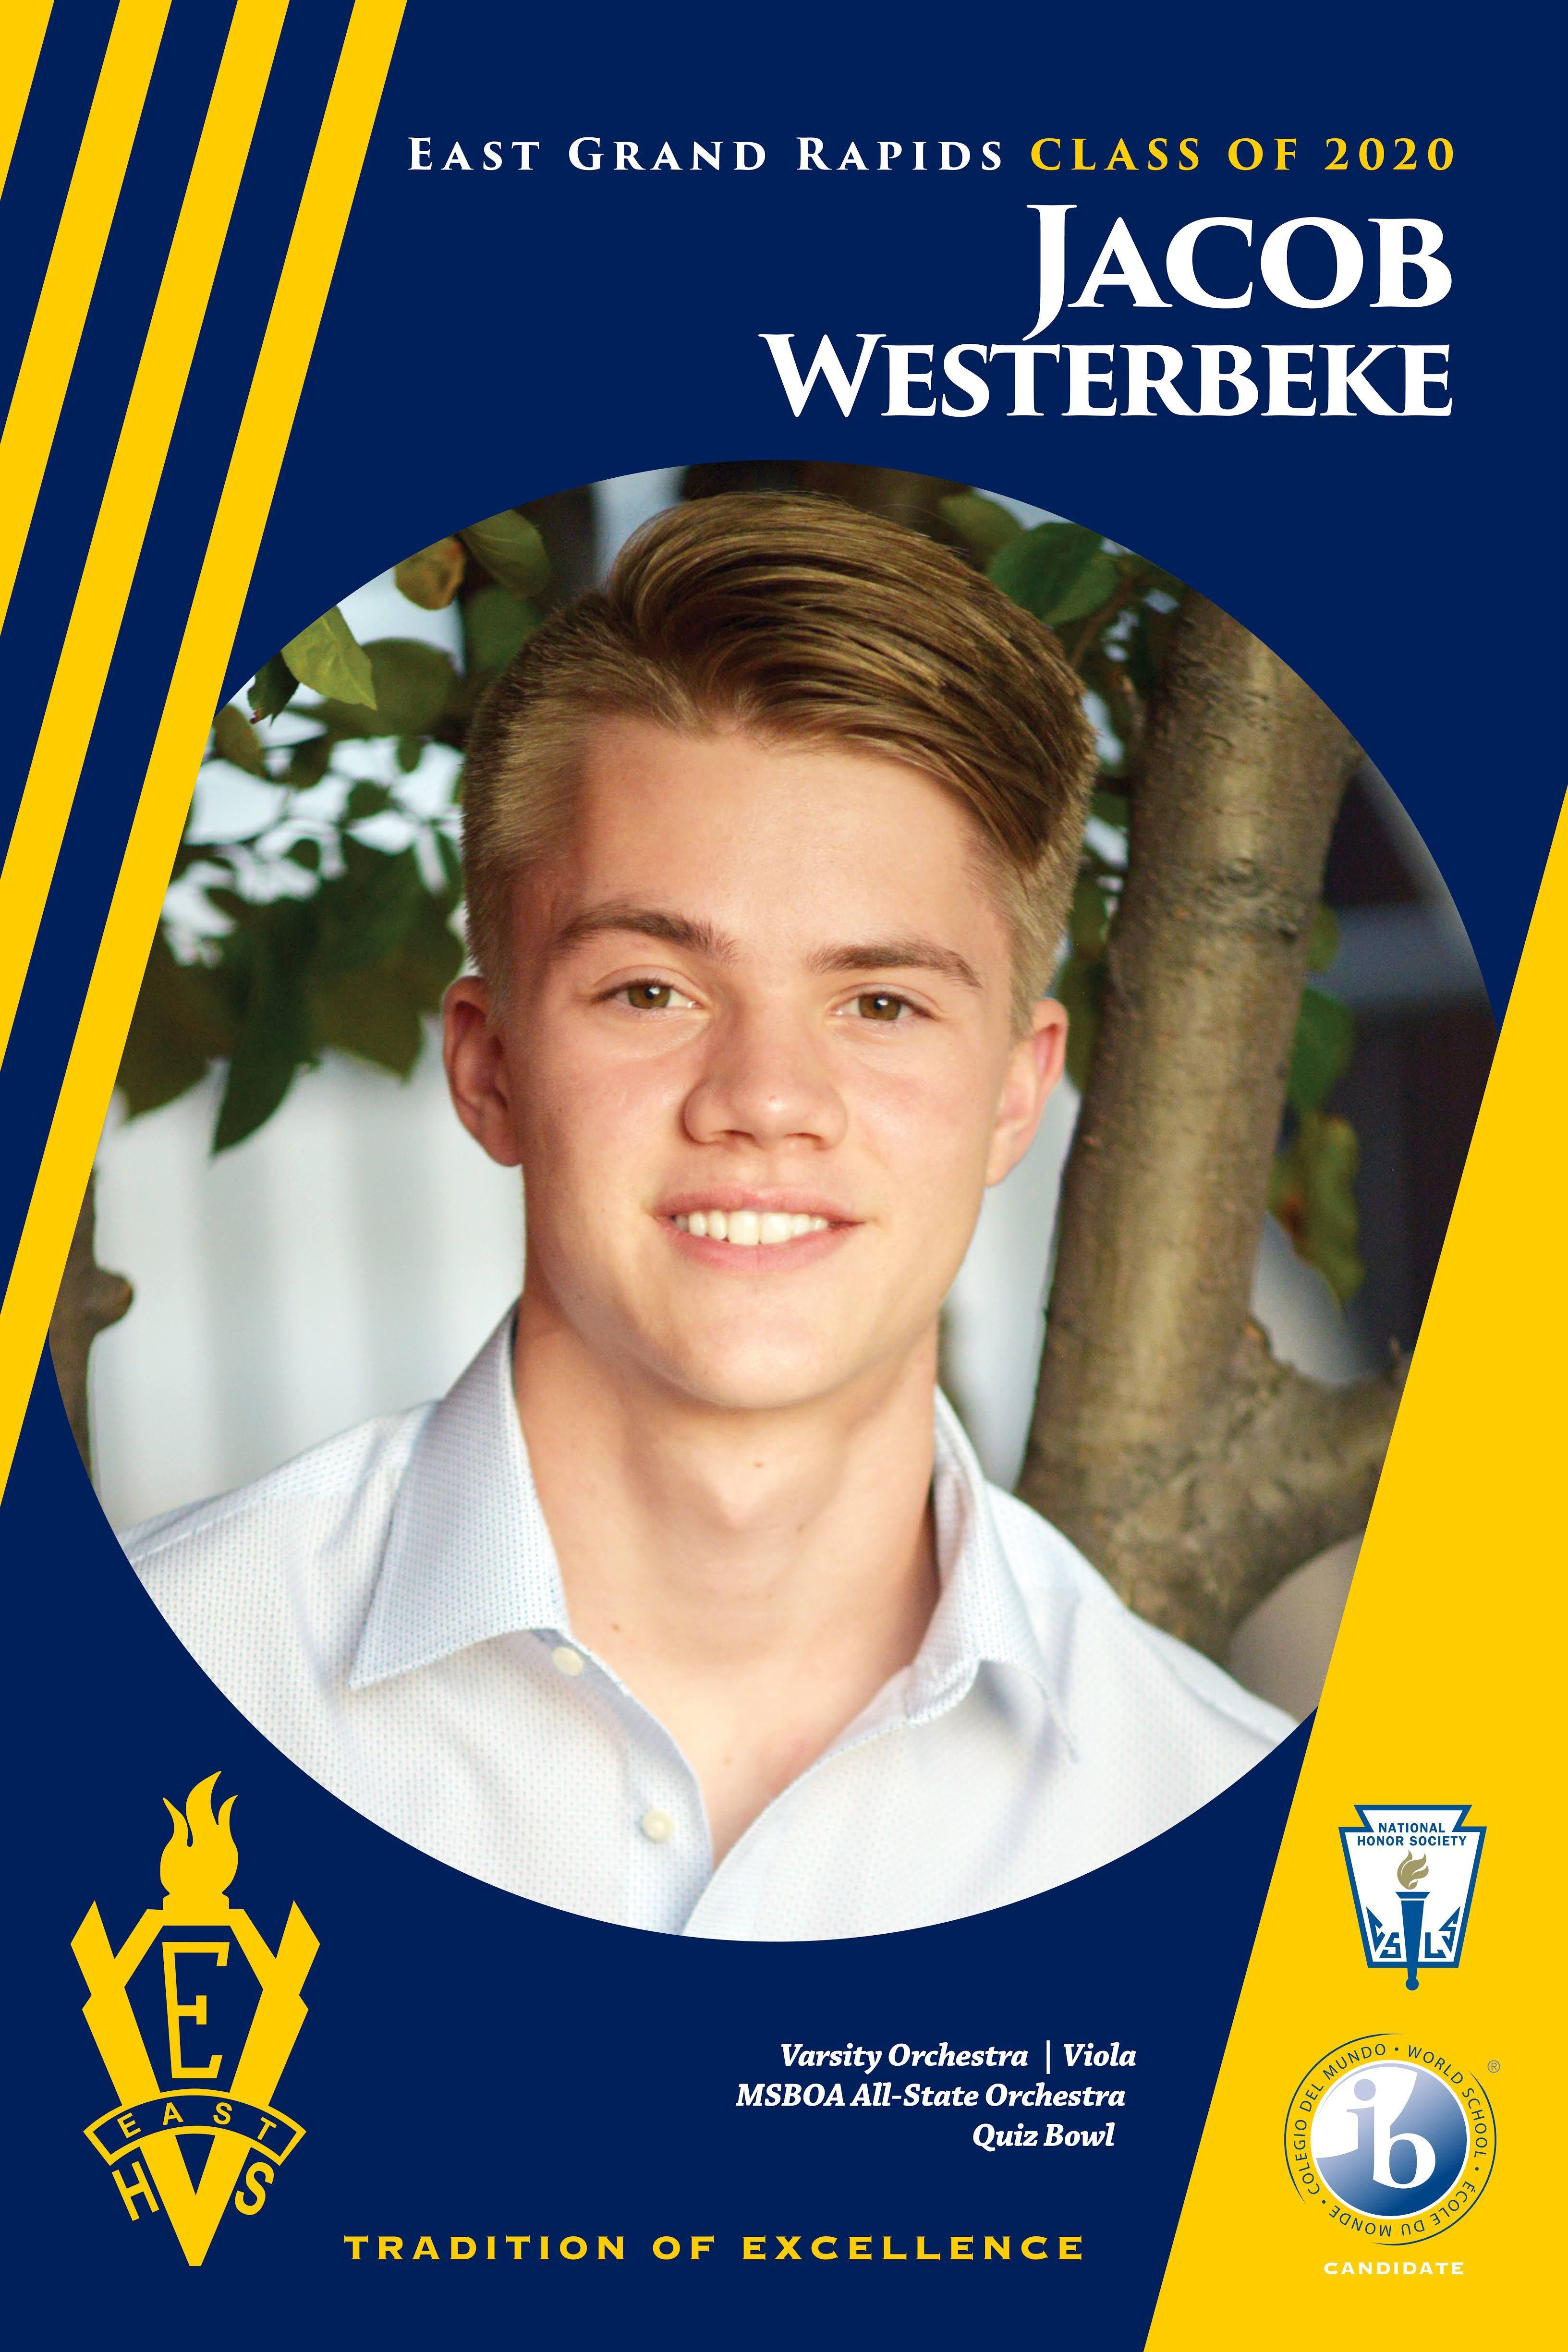 Jacob Westerbeke